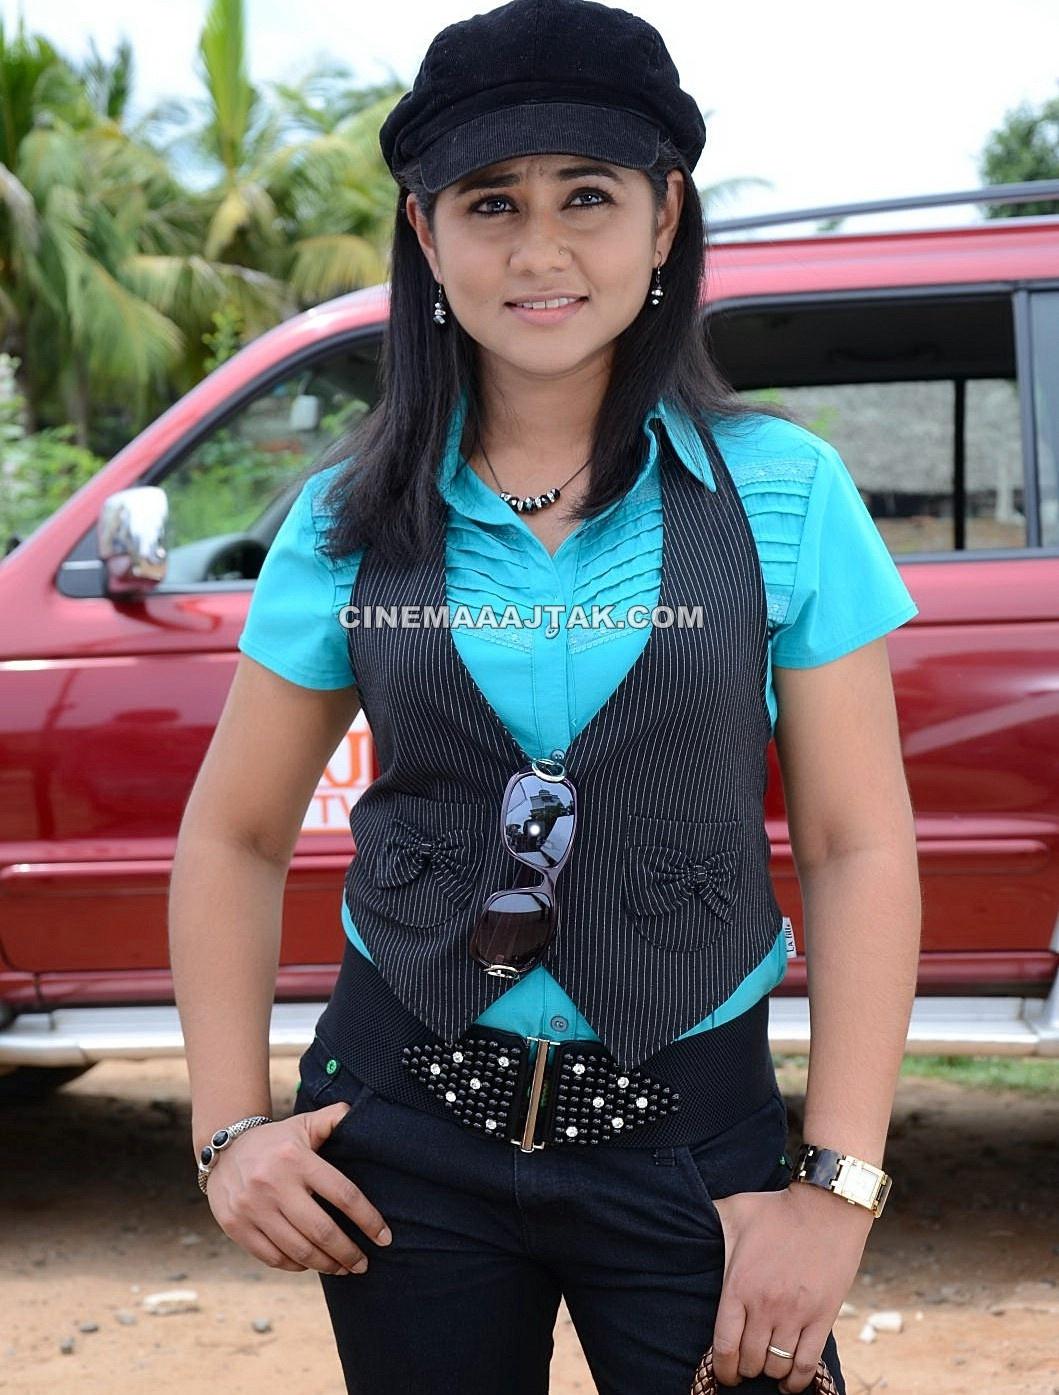 http://2.bp.blogspot.com/-x38vih1Yuw4/TpILJ9alWTI/AAAAAAAAEnw/R_sUzpKMJ3M/s1600/Actress+Punnagai+Poo+Gheetha+Exclusive+Images.jpg